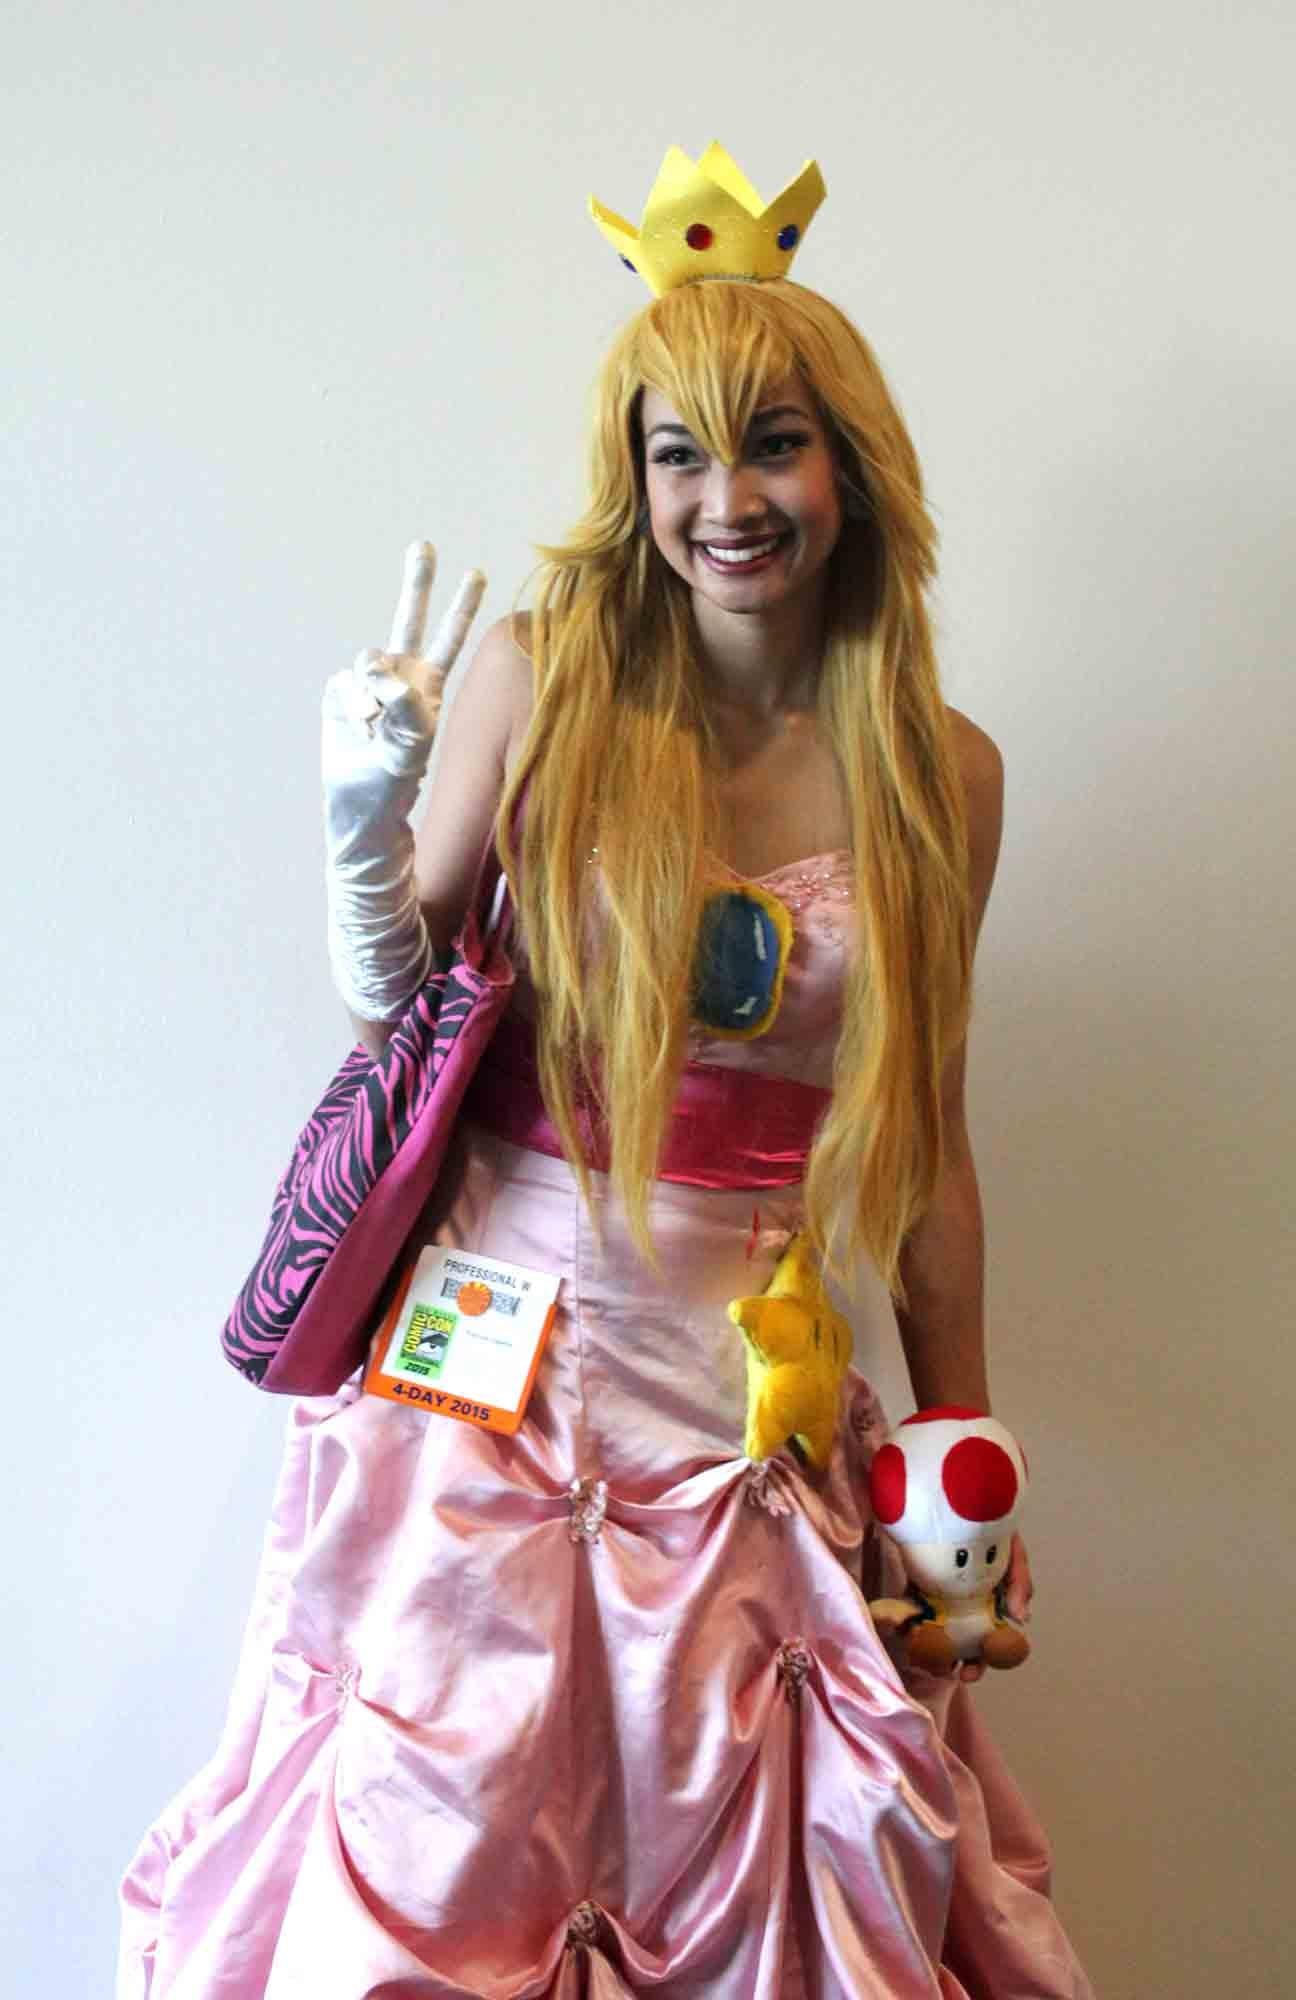 Princess peach cosplay costume